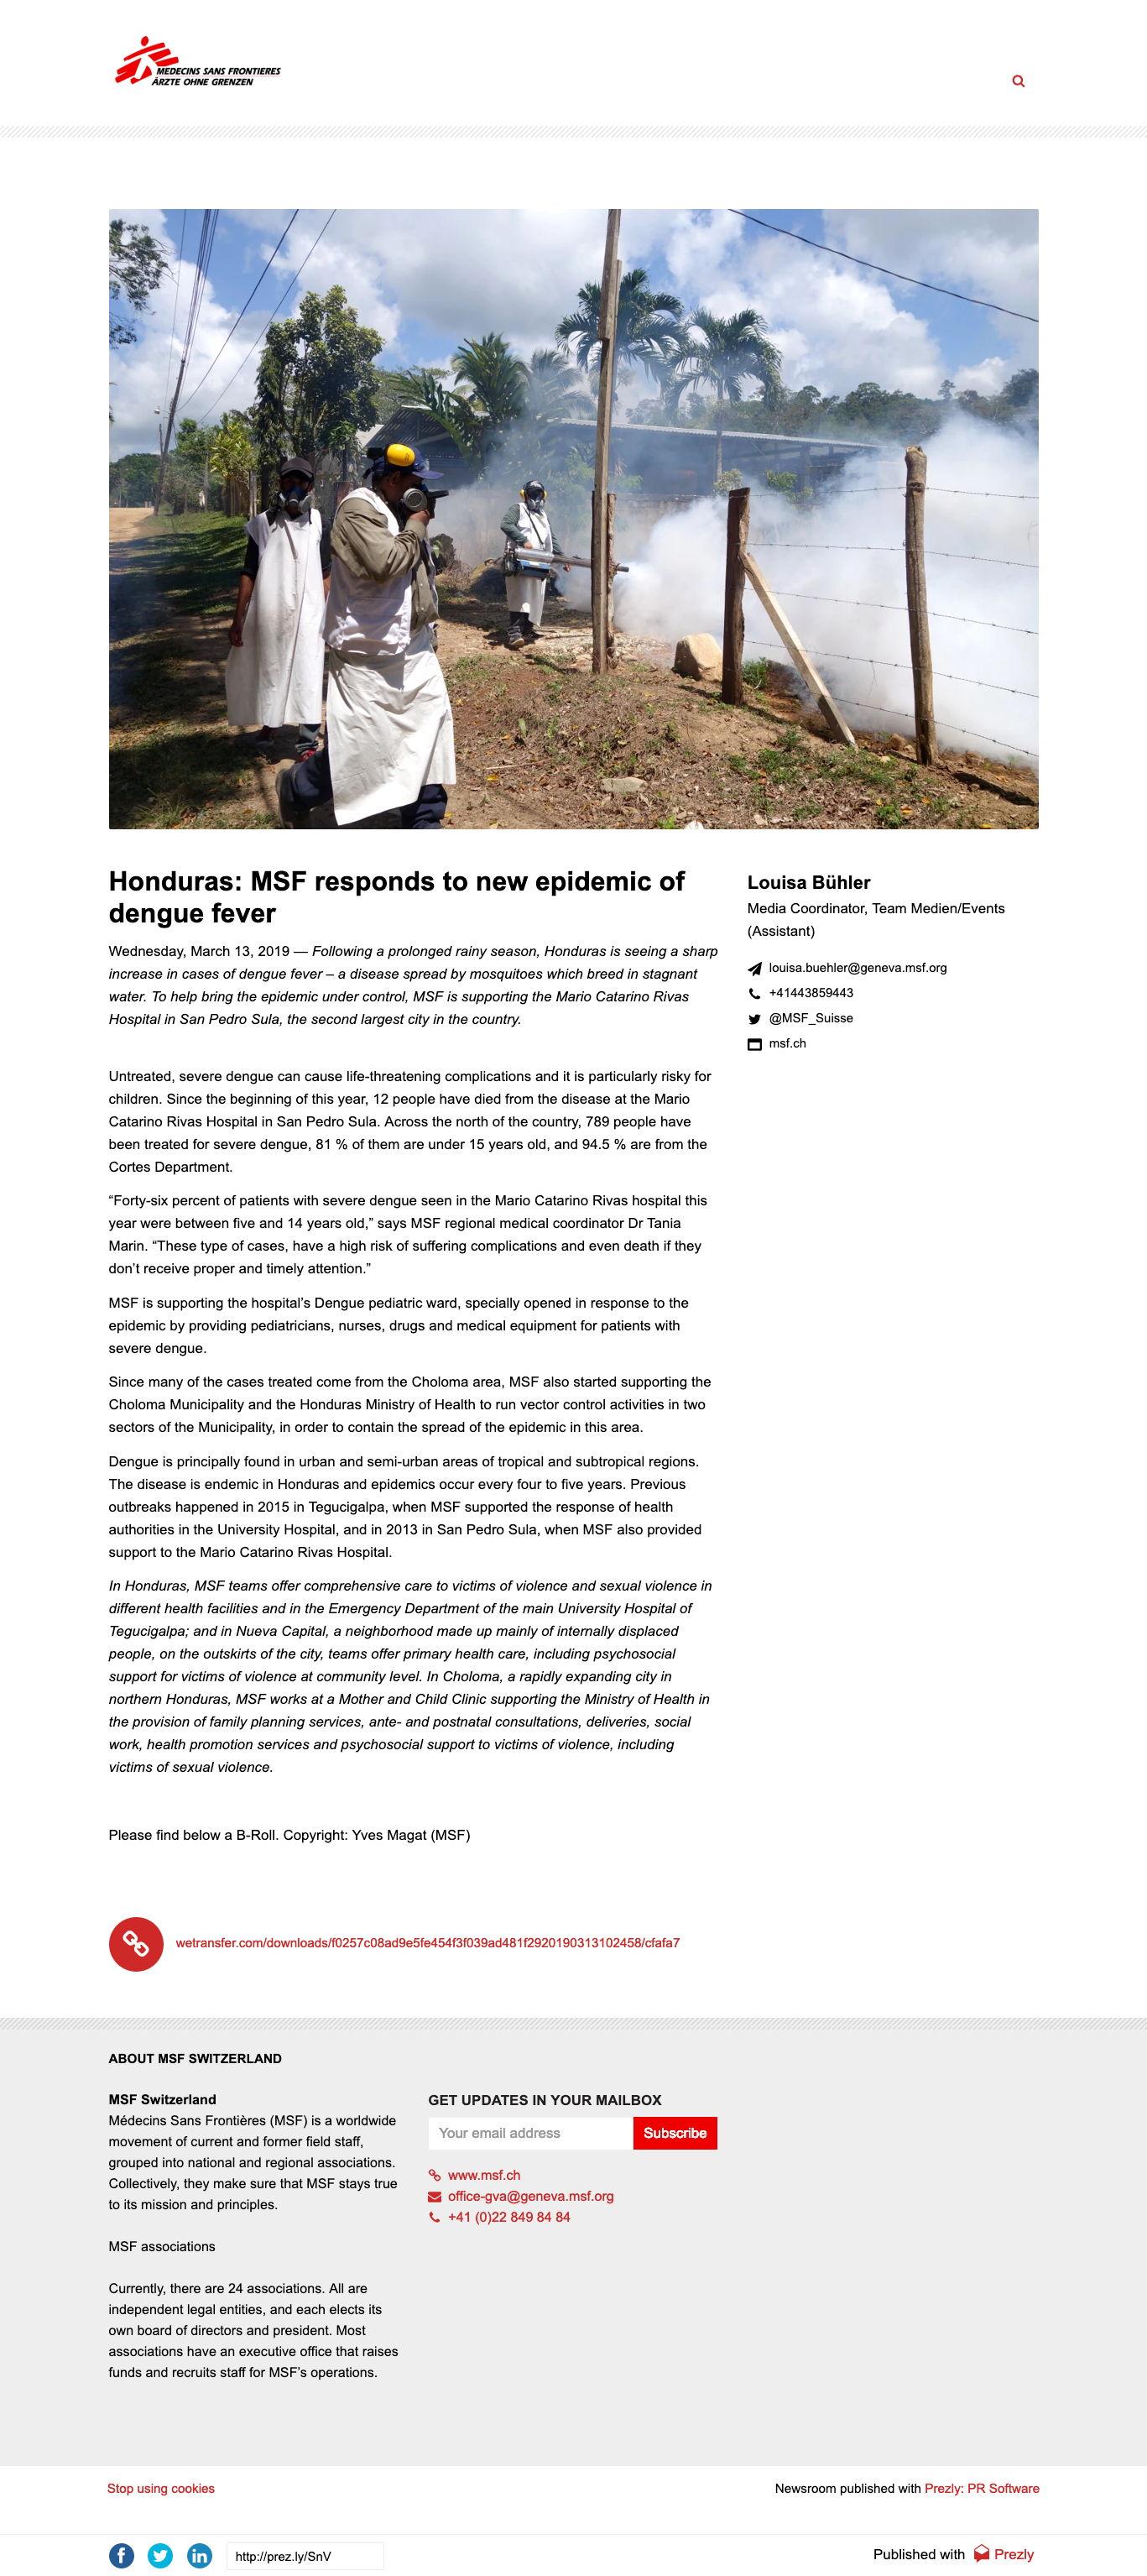 Dengue Fever Response Press Release - MSF - Prezly